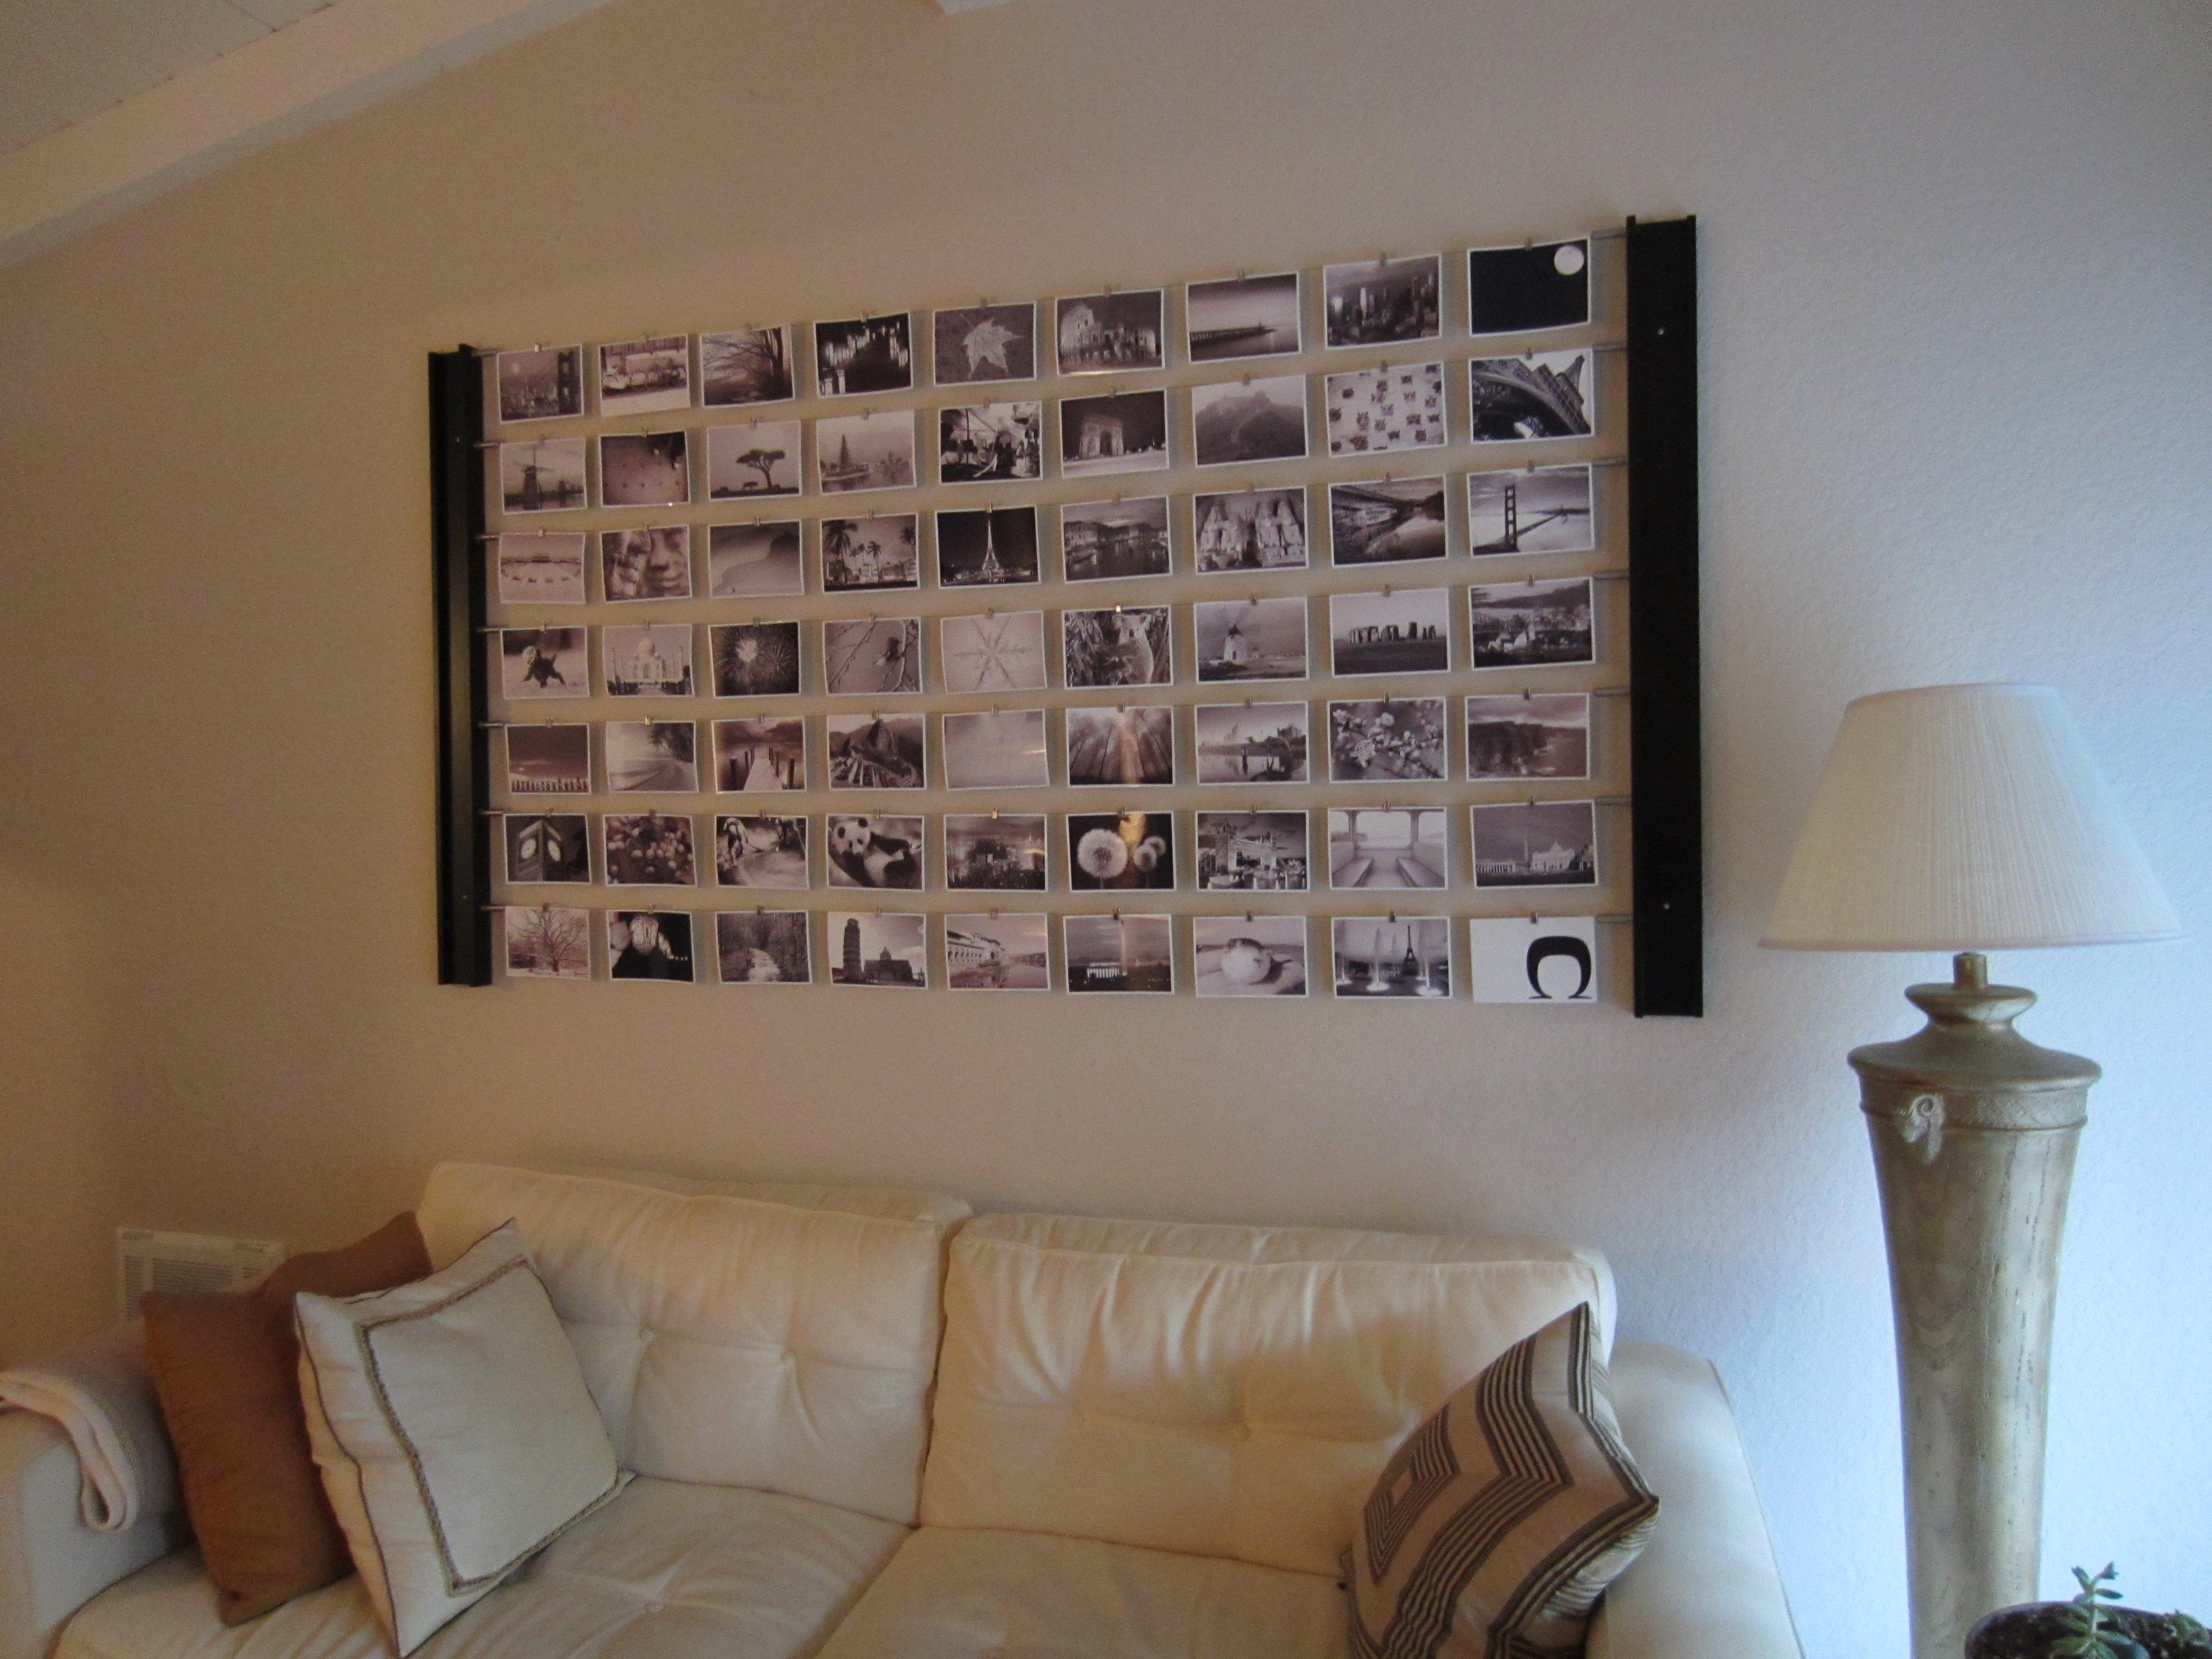 10 Great Do It Yourself Bedroom Ideas bedroom decor ideas diy photo album images are phootoo foruum co 2021